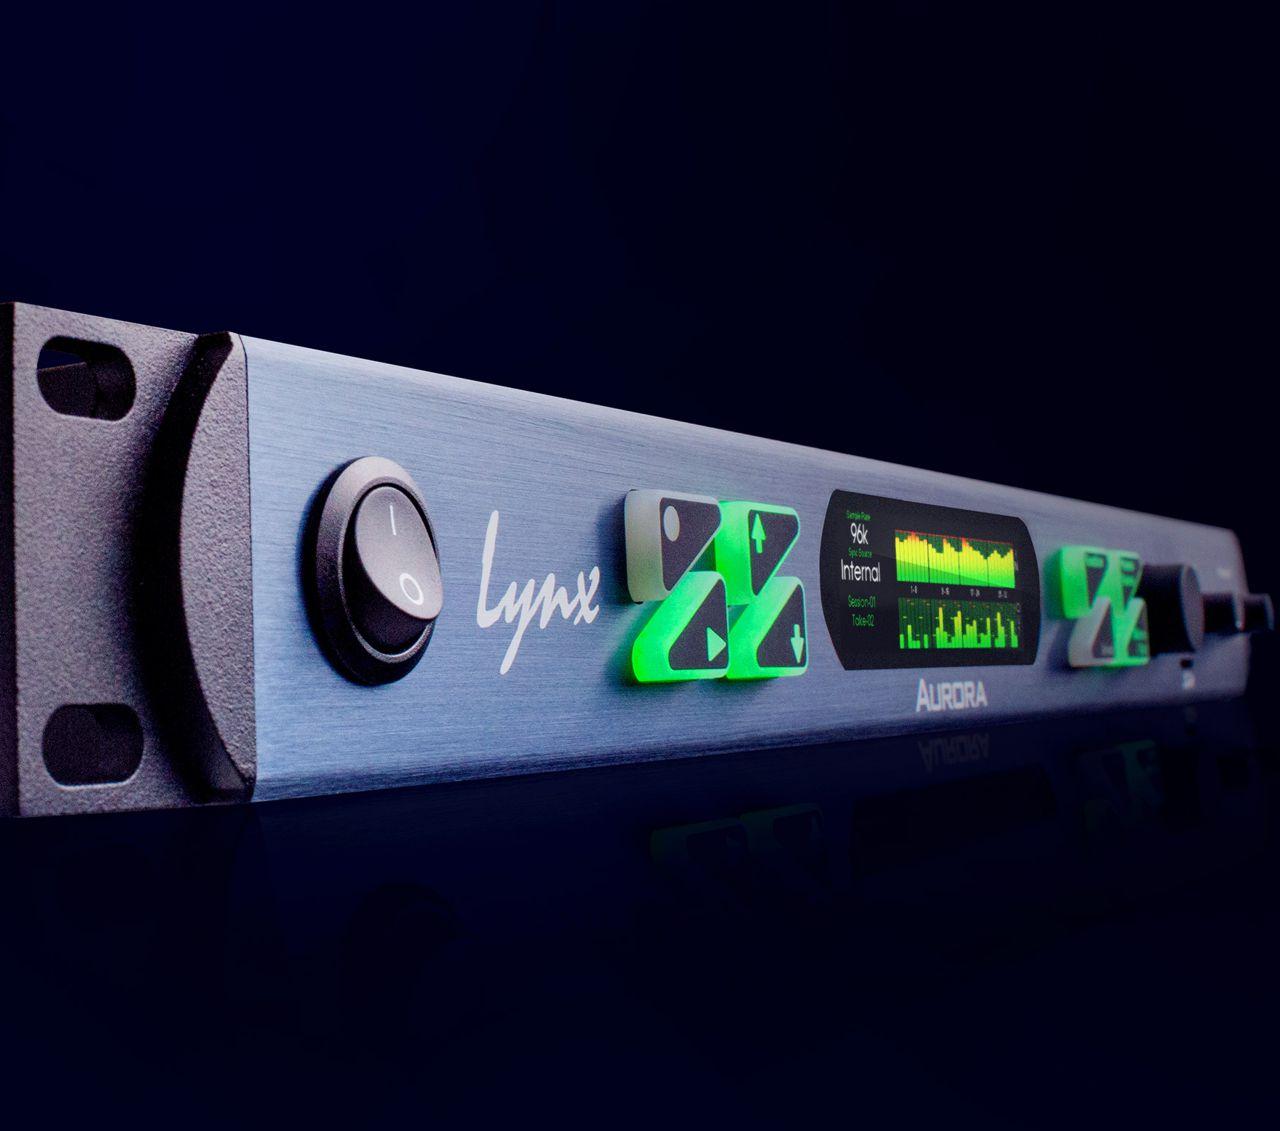 LT-TB3, Lynx Studio´s New Expansion Card